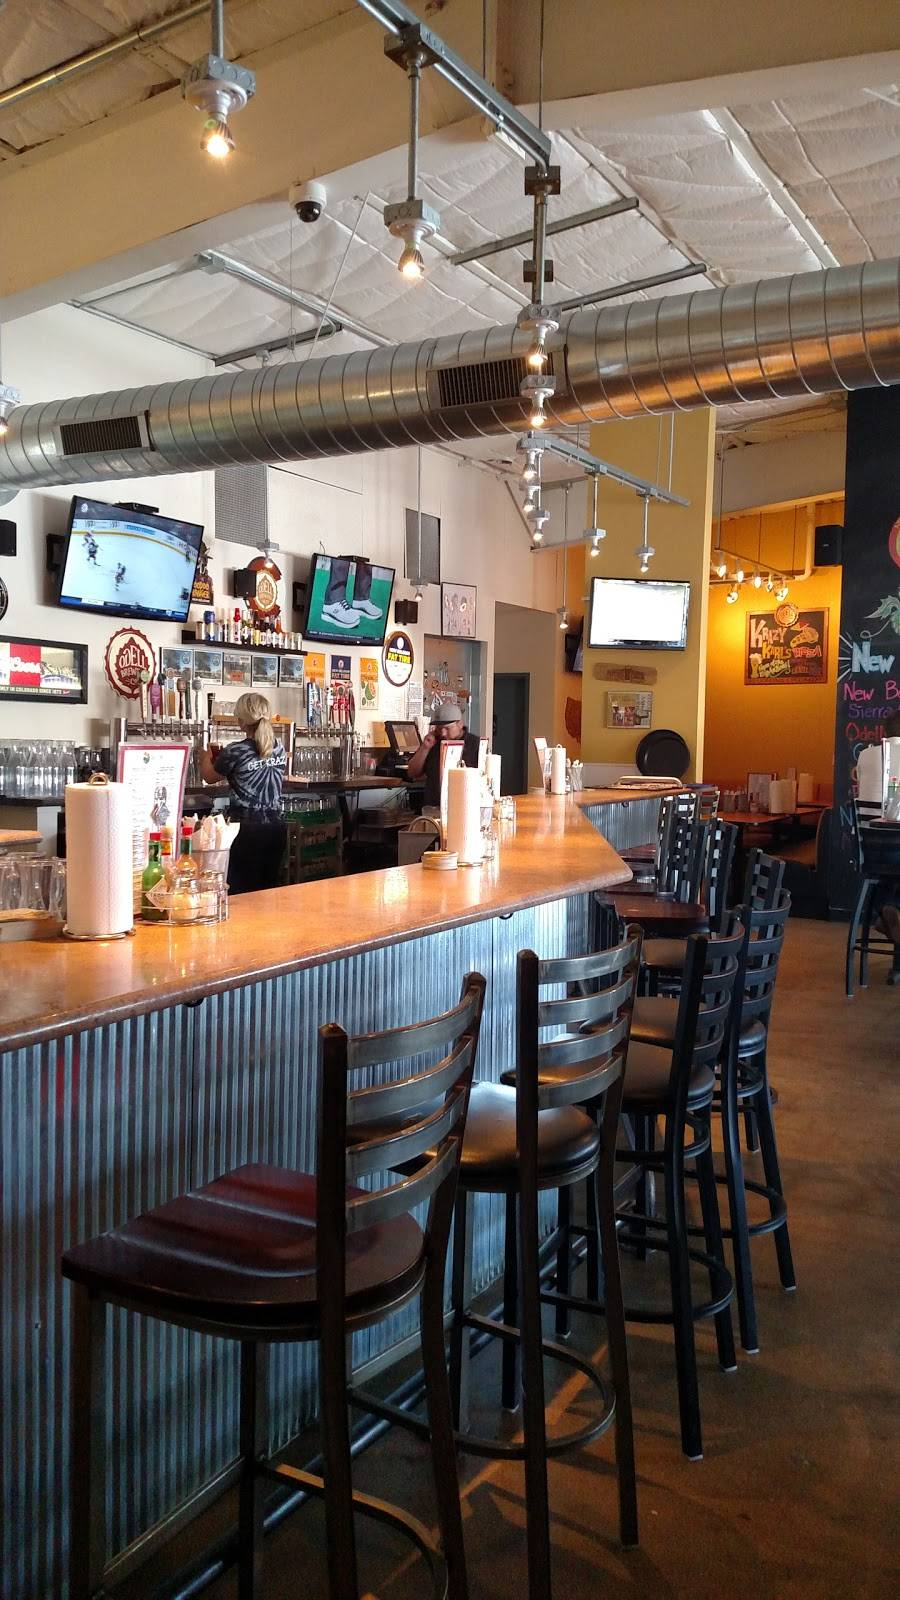 Krazy Karls Pizza and Sport Bar | meal delivery | 1124 W Elizabeth St, Fort Collins, CO 80521, USA | 9702242000 OR +1 970-224-2000